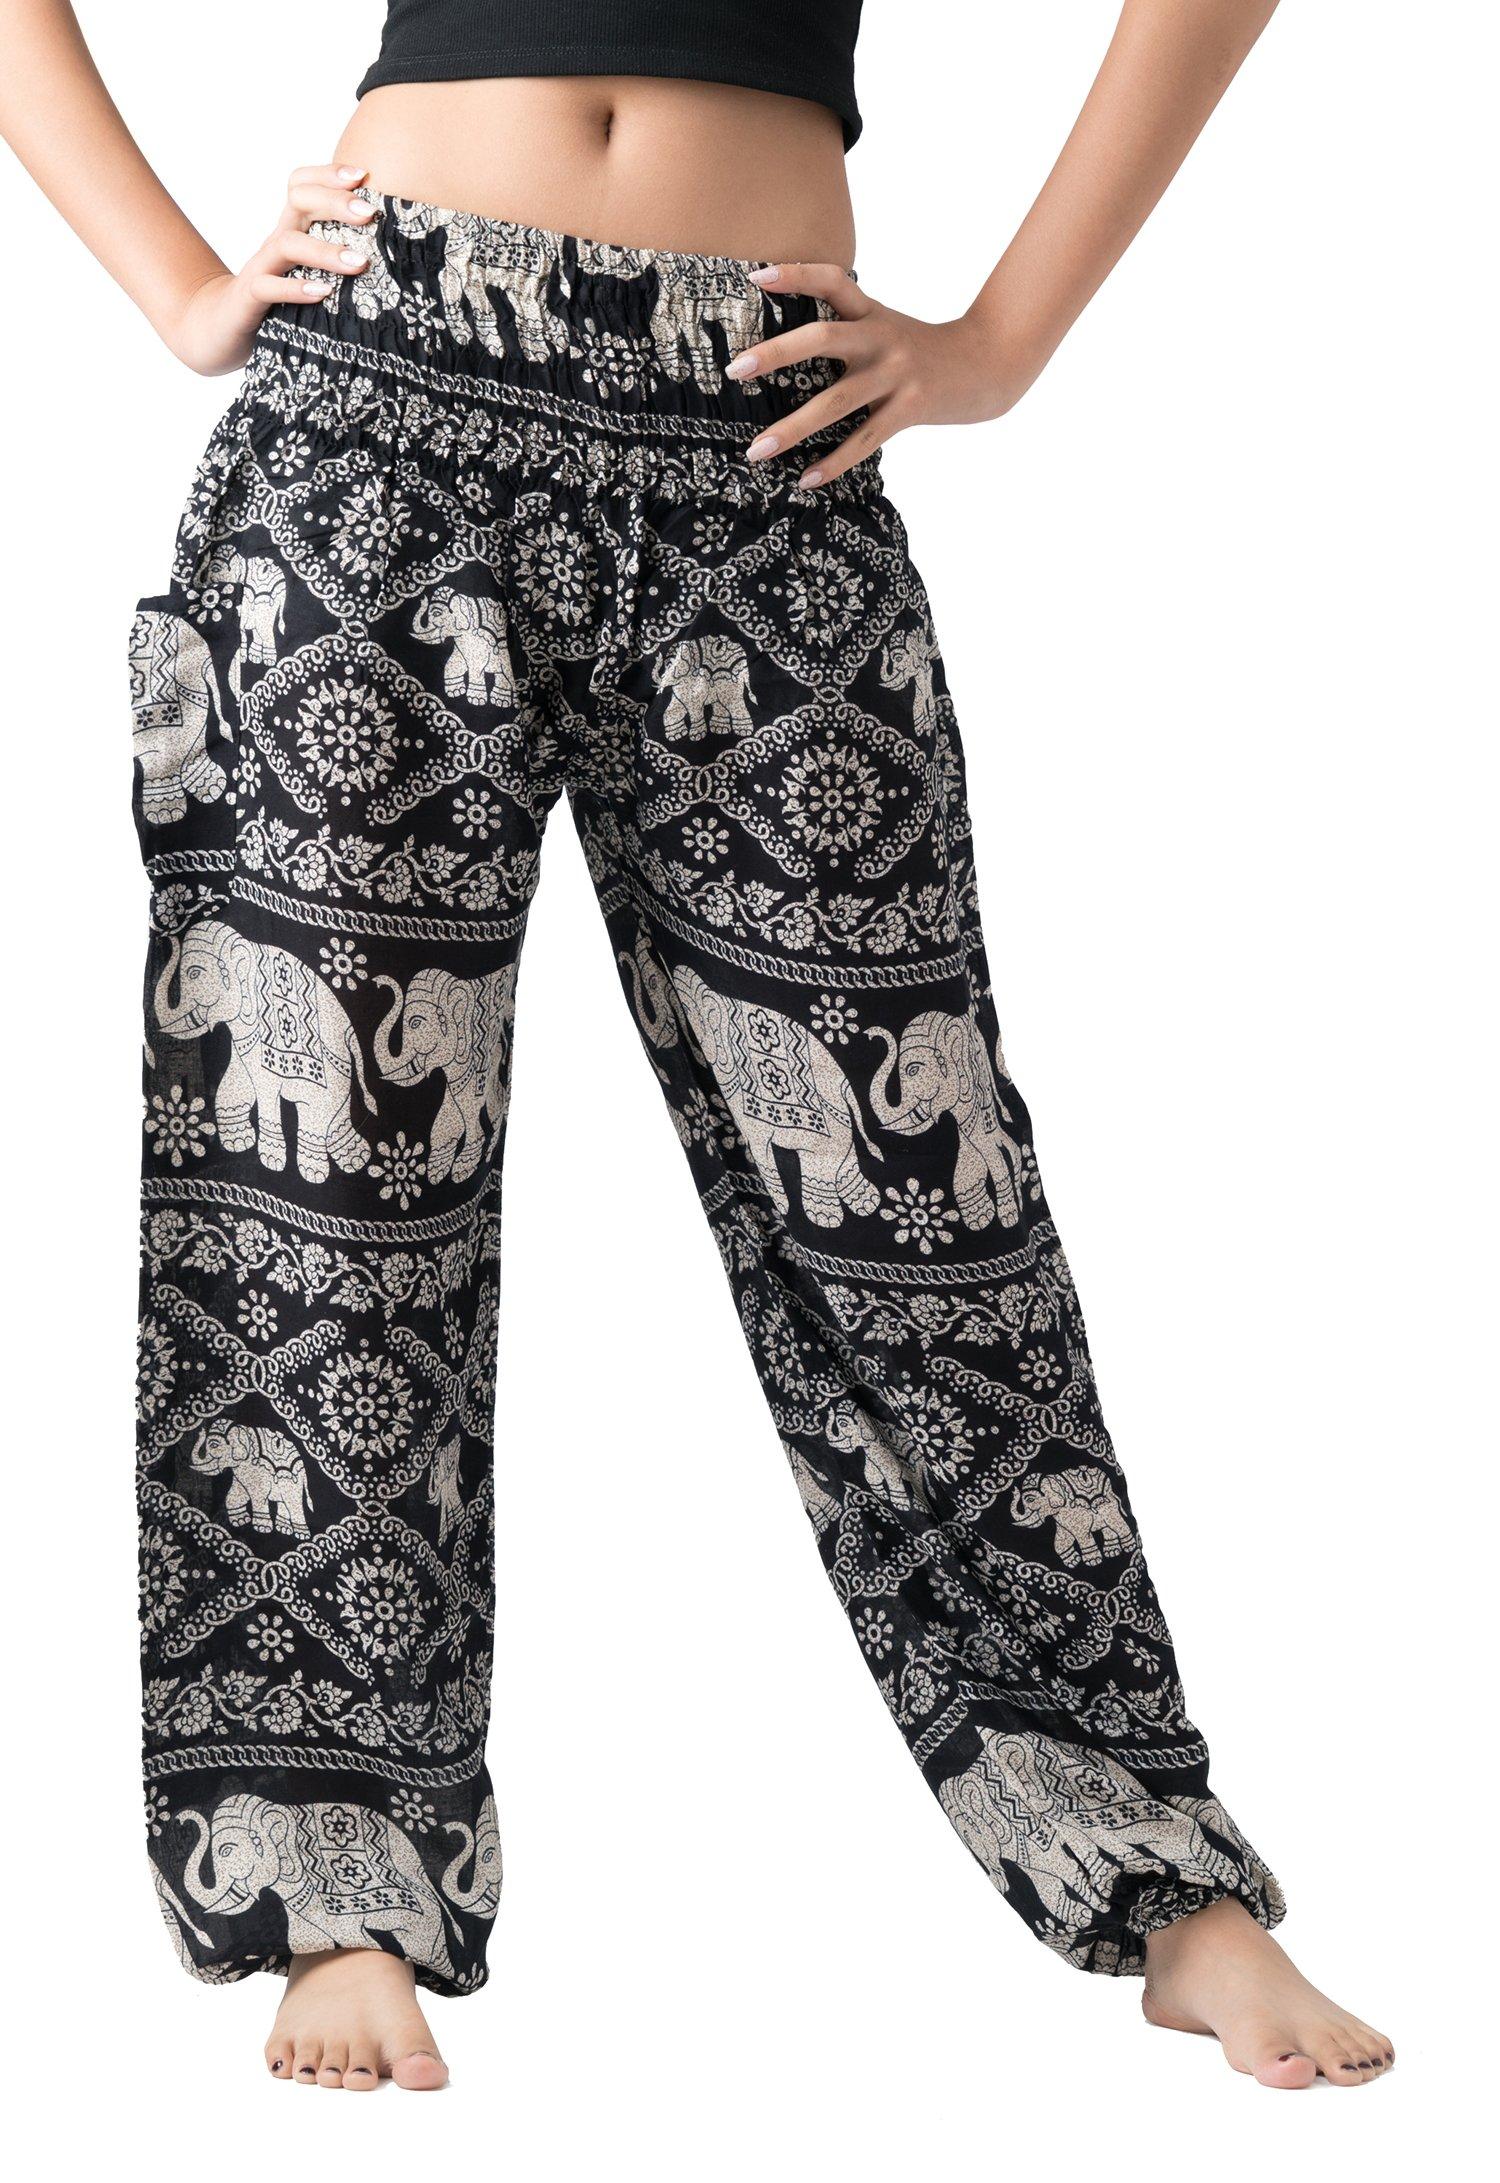 Bangkokpants Women's Casual Pants Harem Bohemian Clothes Hippie Boho Yoga Outfits Smocked Waist (Black, One Size)